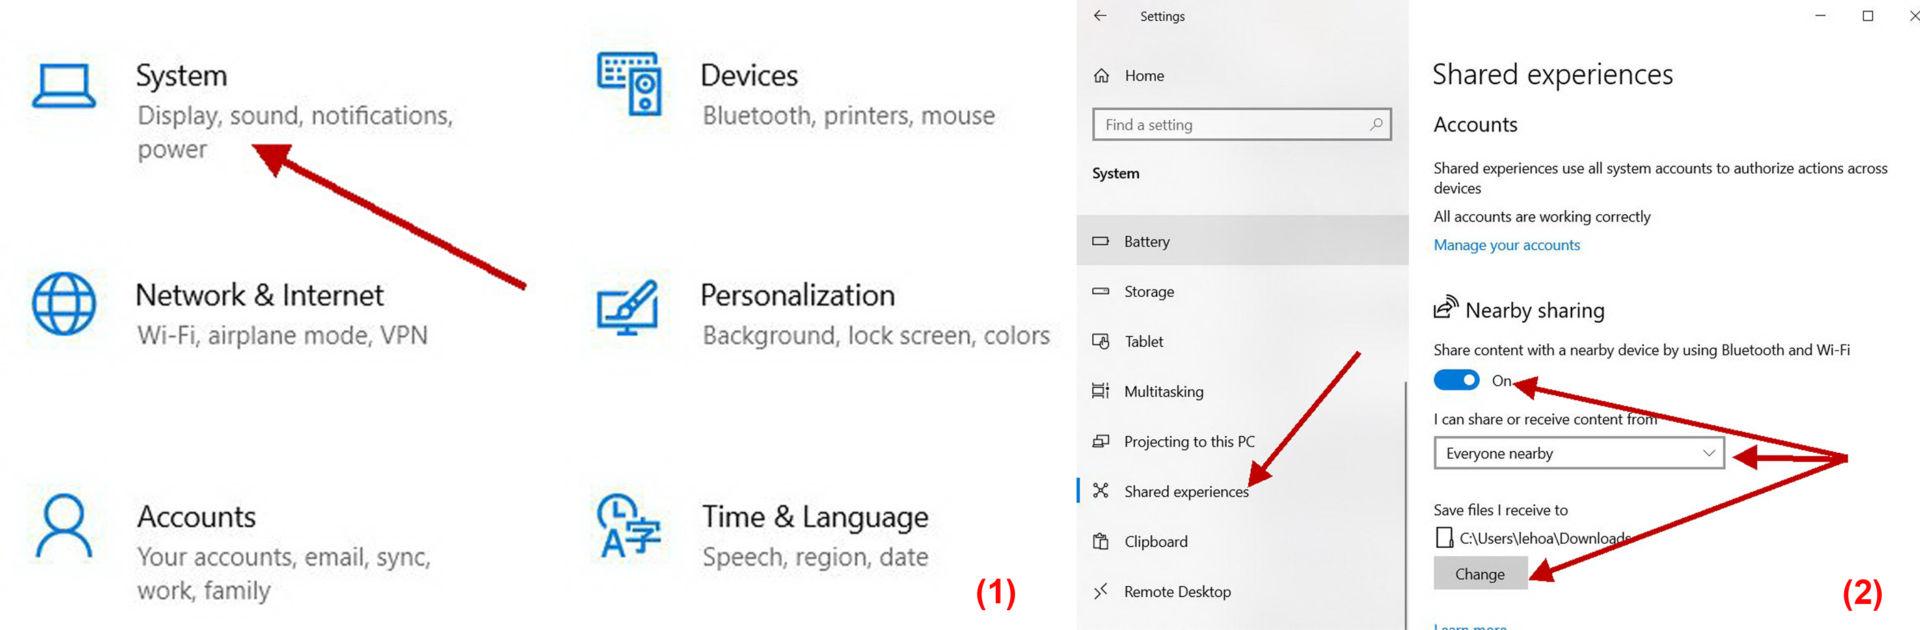 Sử dụng Nearby Sharing trong Windows 10 - 1